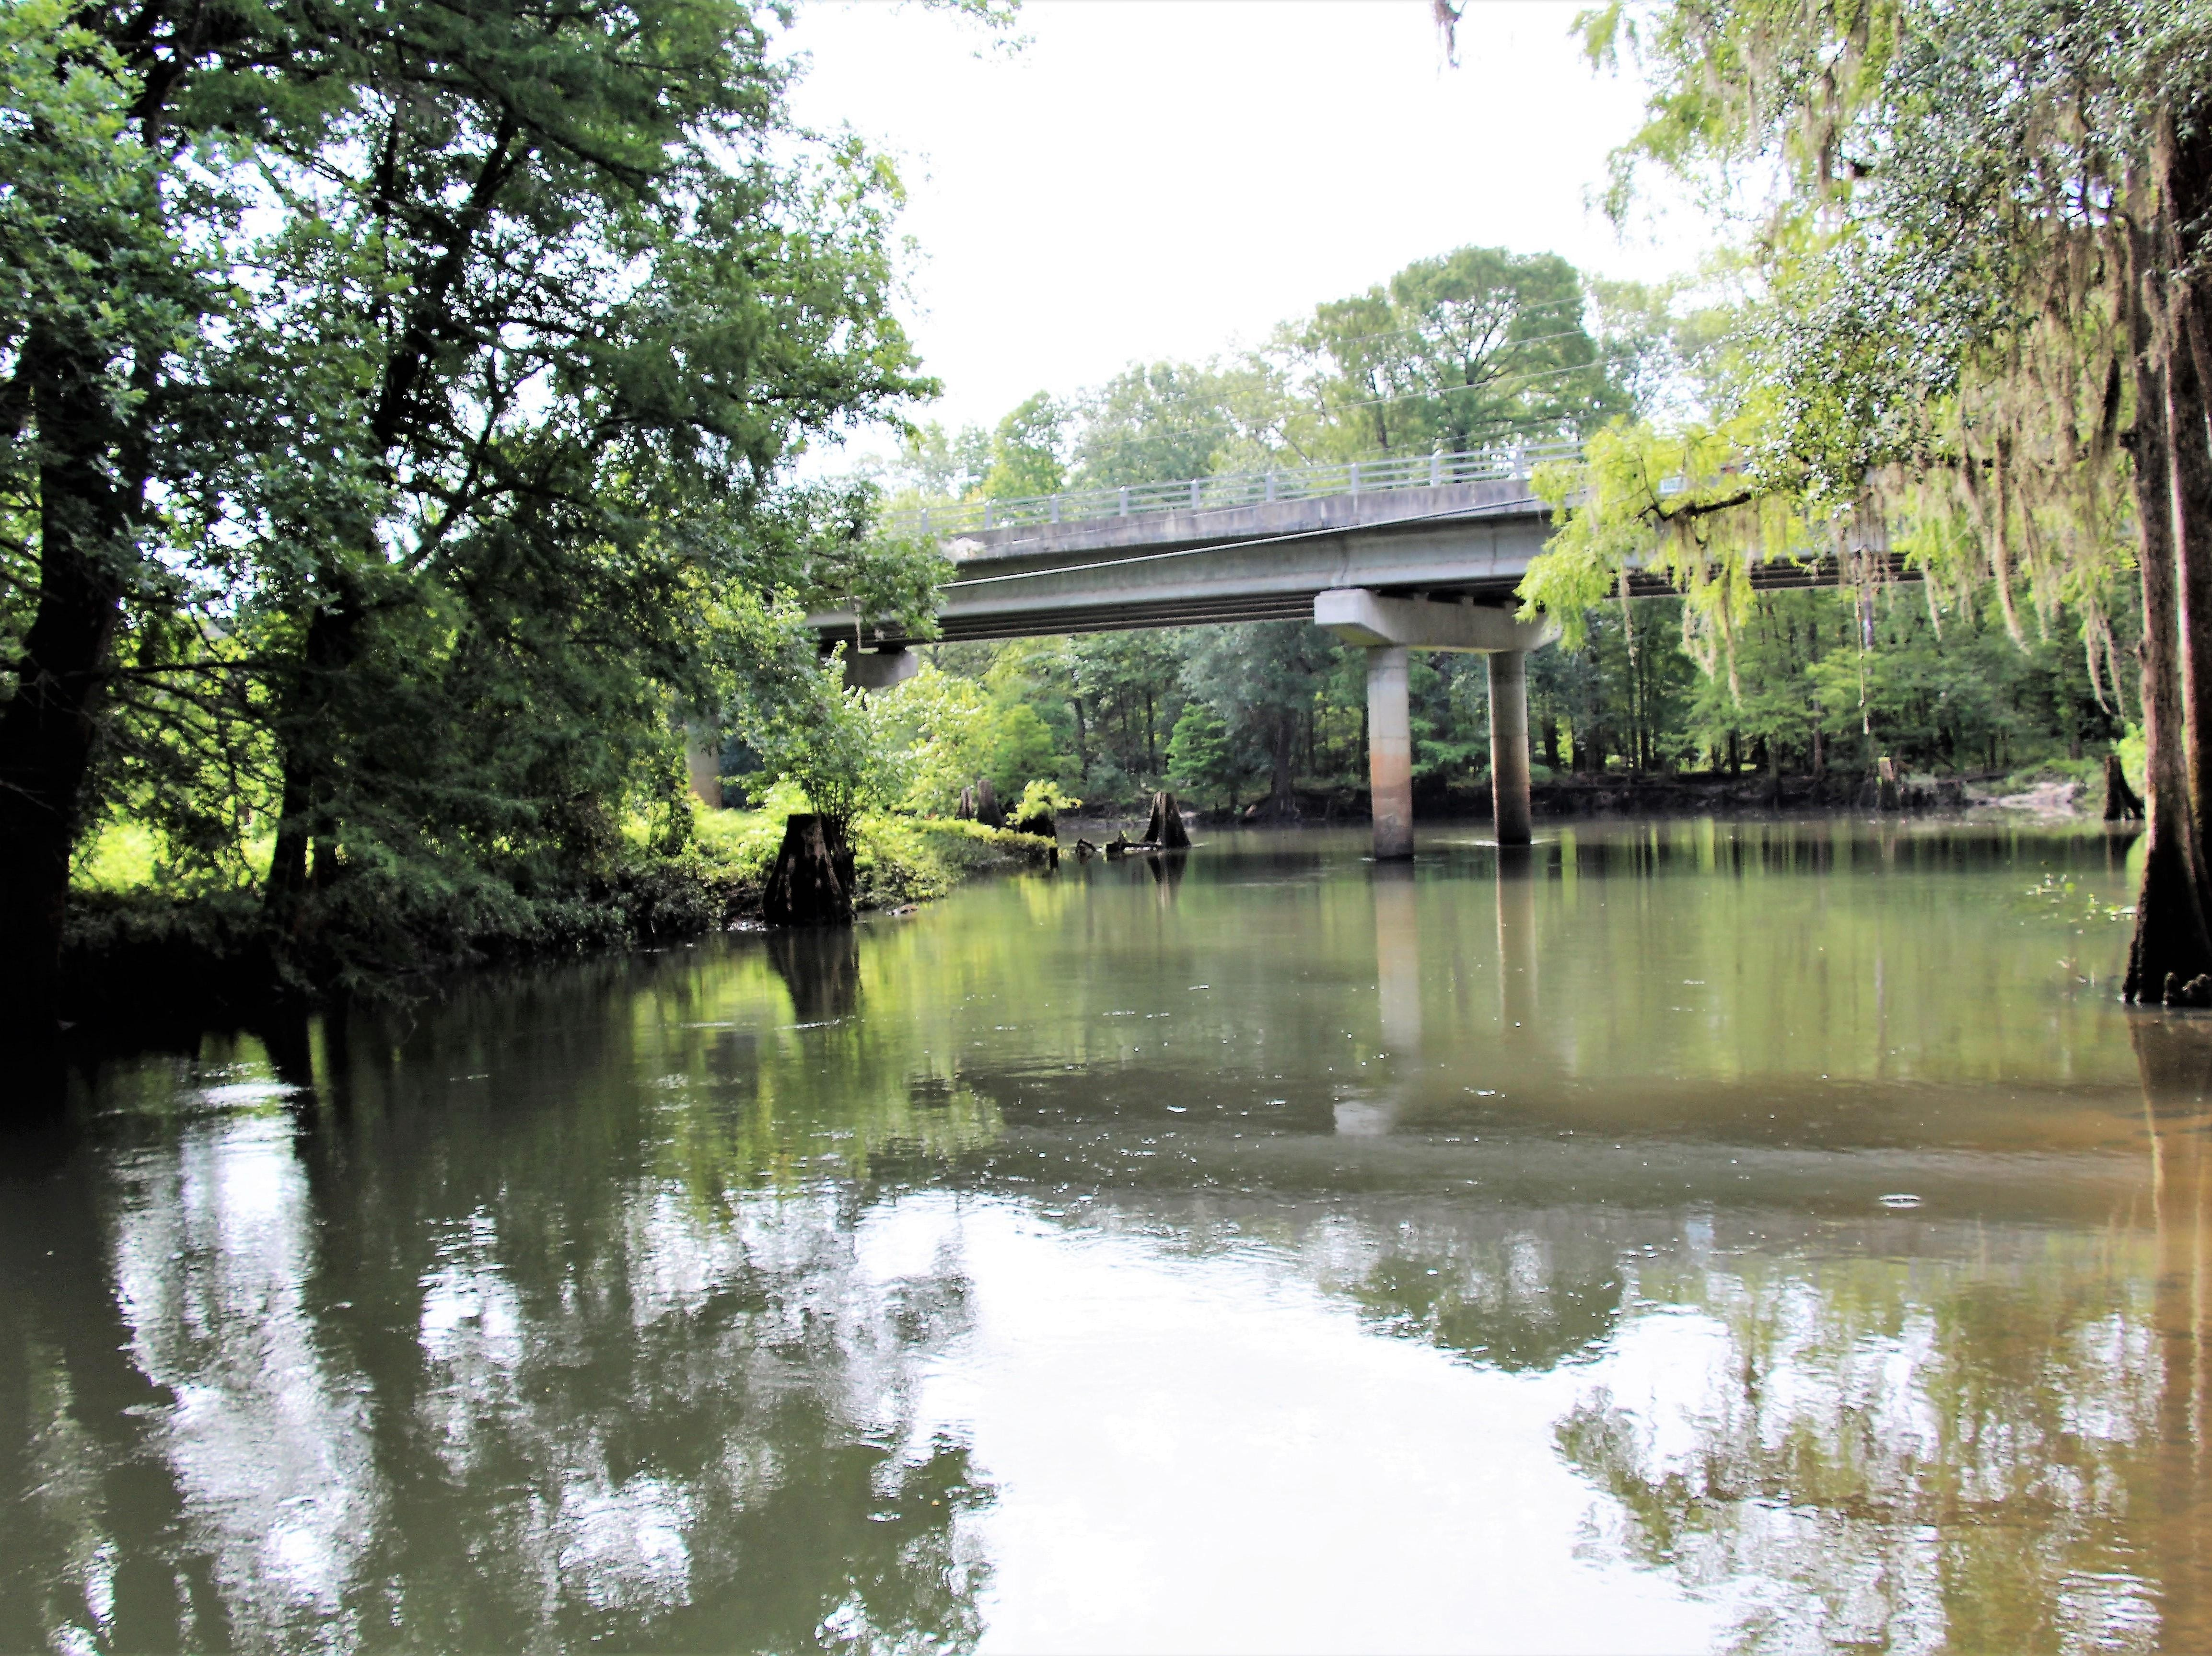 Yancey Bridge over the Chipola River in Marianna